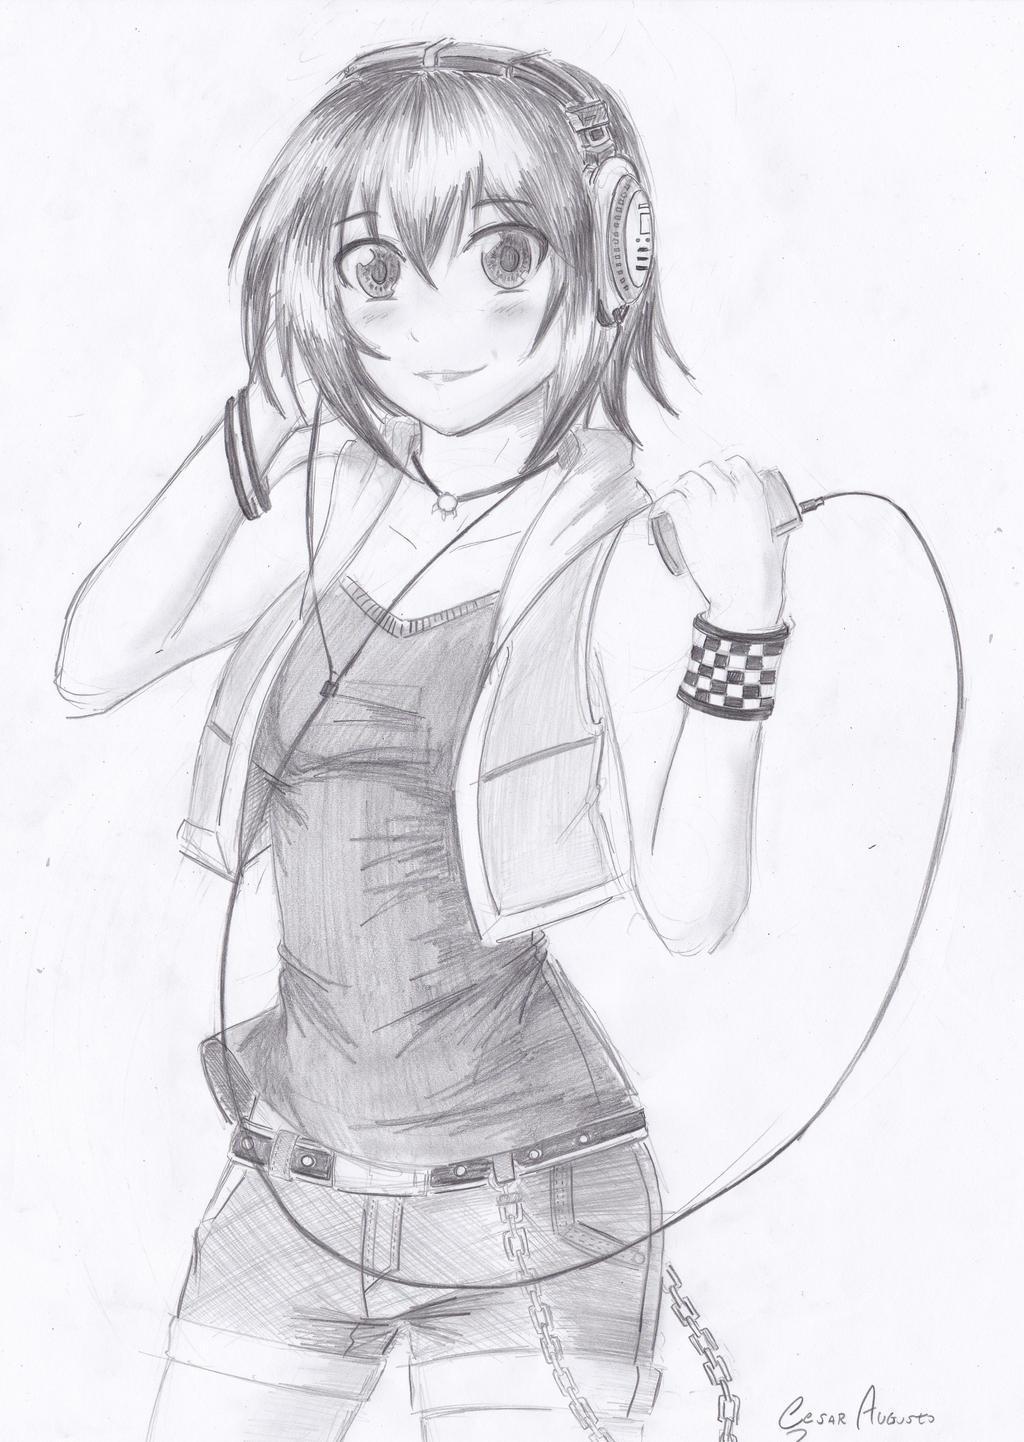 Anime Girl With Hoodie And Headphones Drawing How to draw headphonesHow To Draw Anime Girl With Hoodie